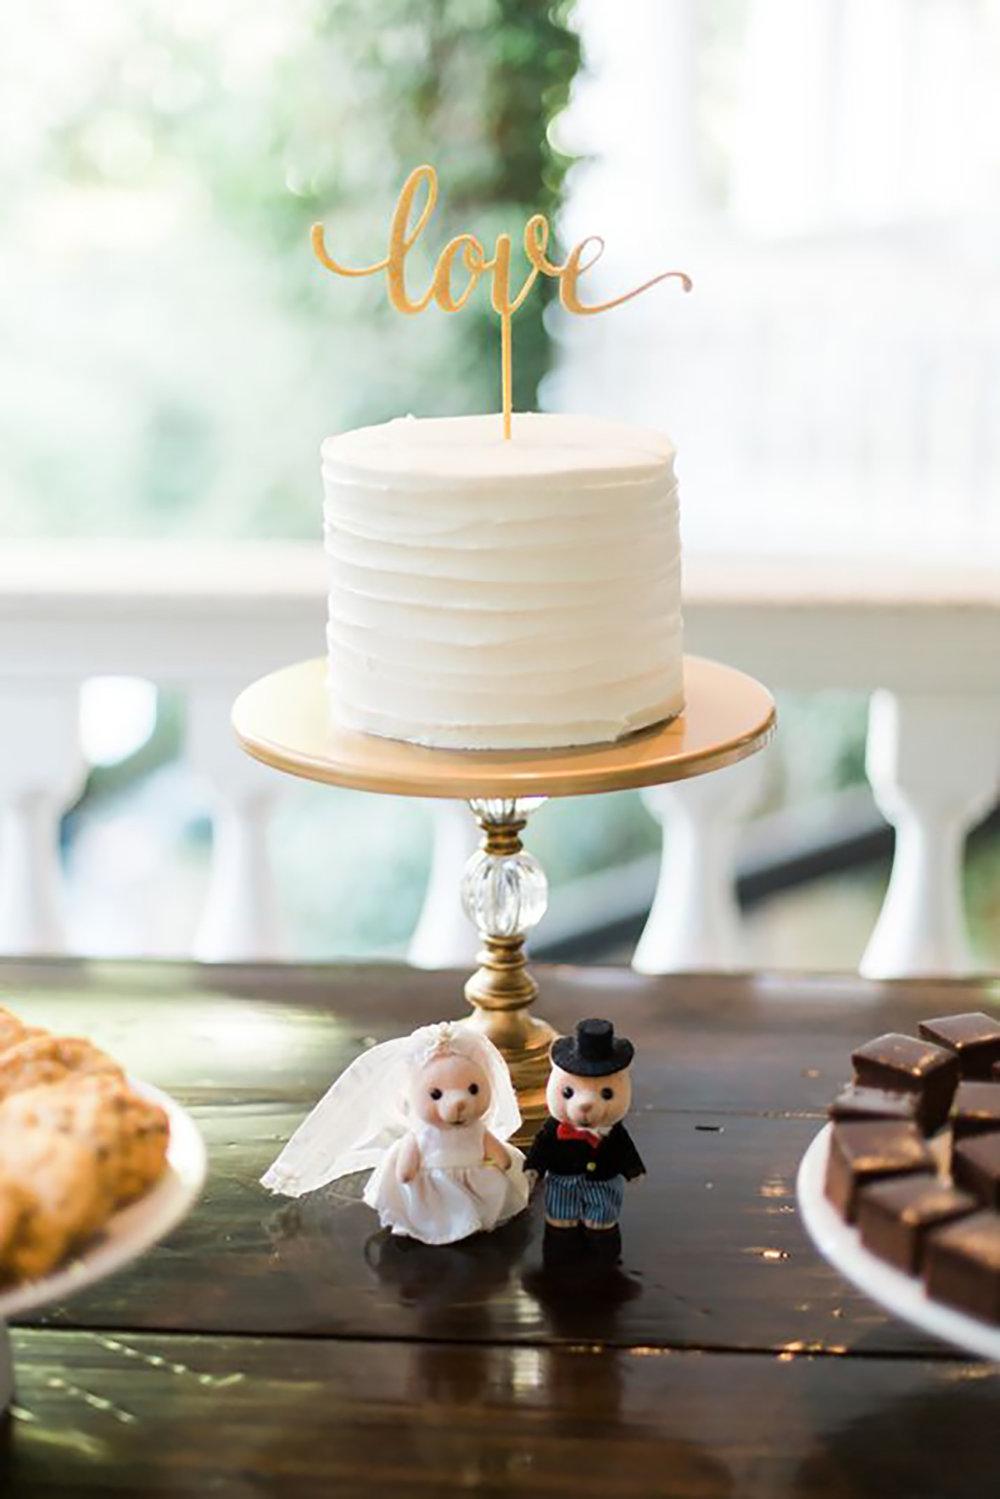 Opulent Treasures Orb Base Cake Stands set of 3 Opulent Treasures